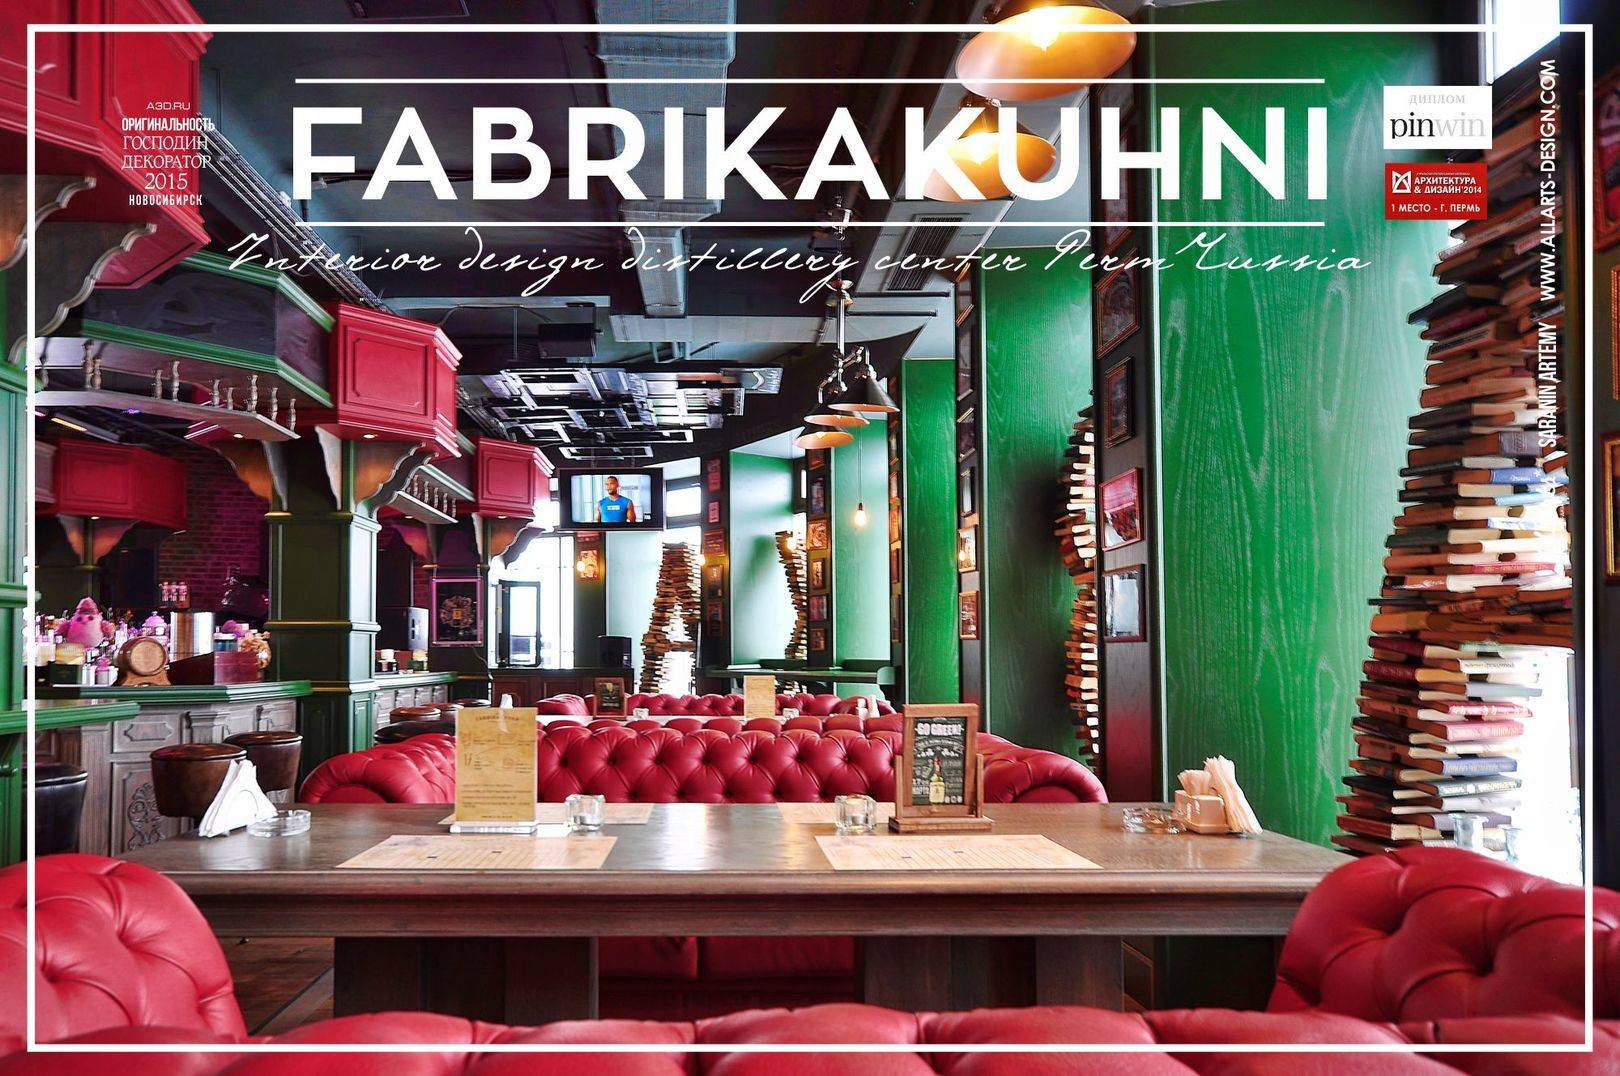 Дизайн интерьера паба и винокурни Fabrikakuhni